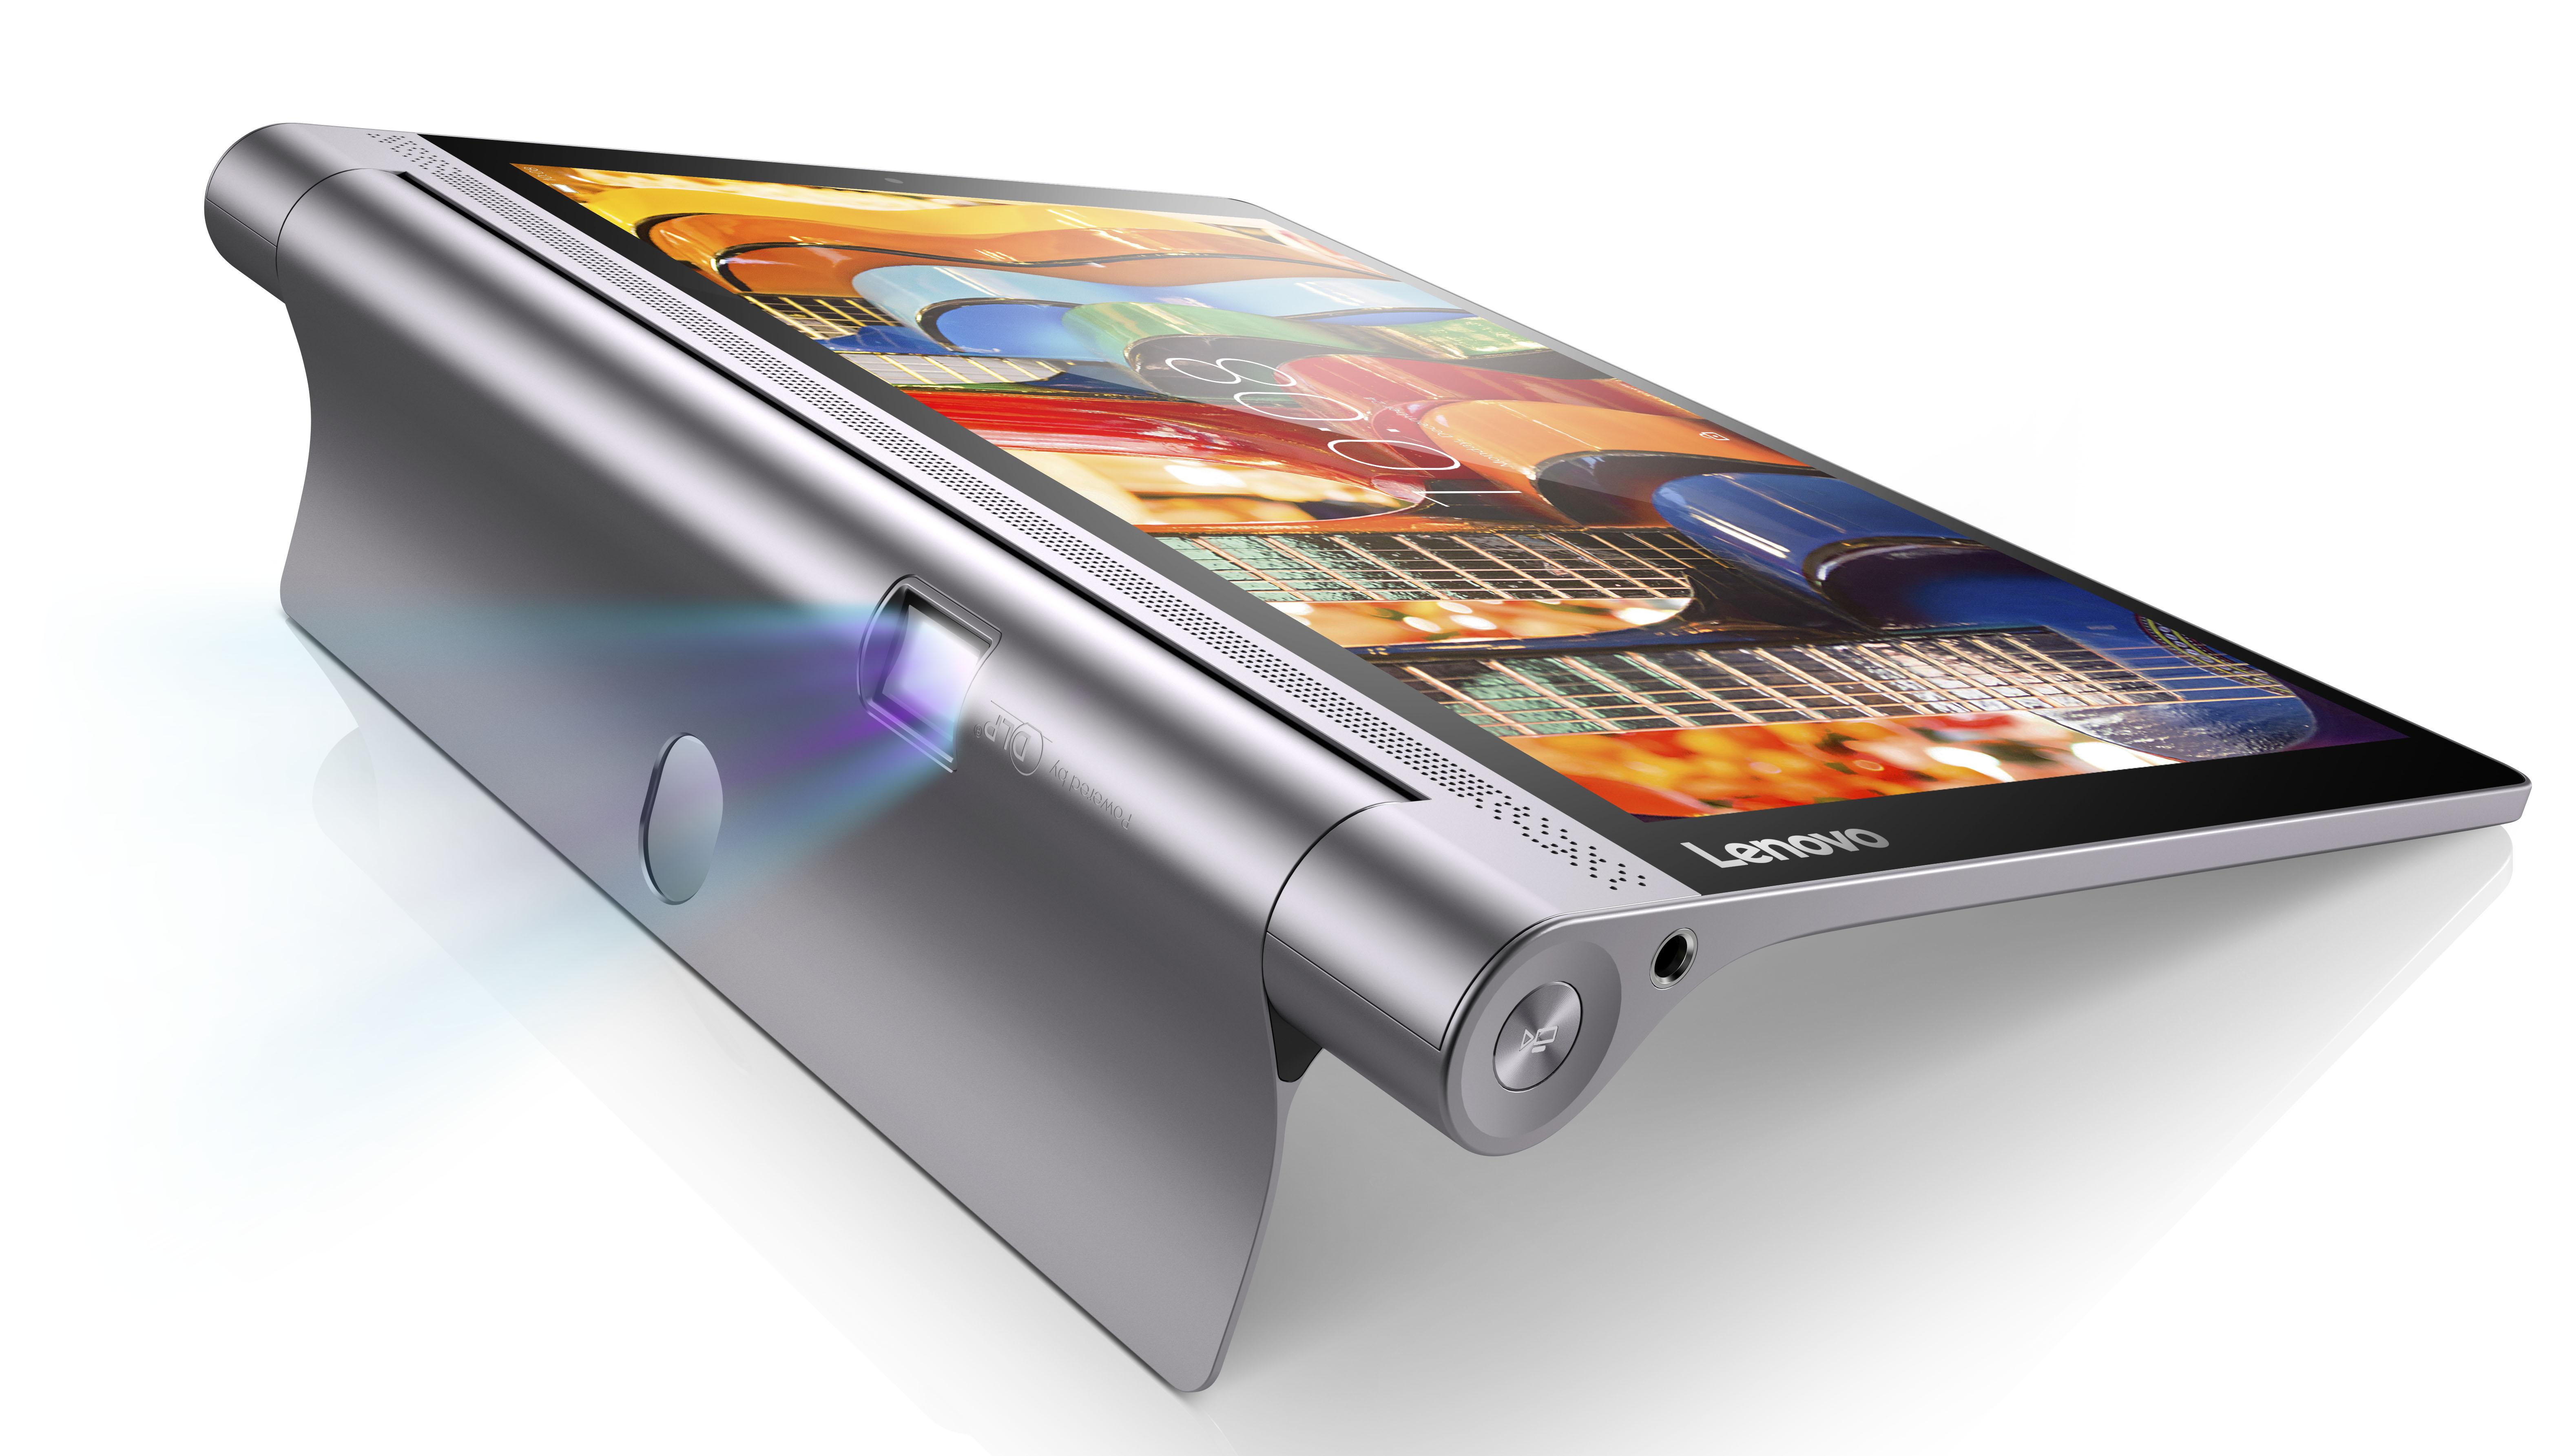 lenovo announces yoga tablet 3 yoga tablet 3 pro and. Black Bedroom Furniture Sets. Home Design Ideas